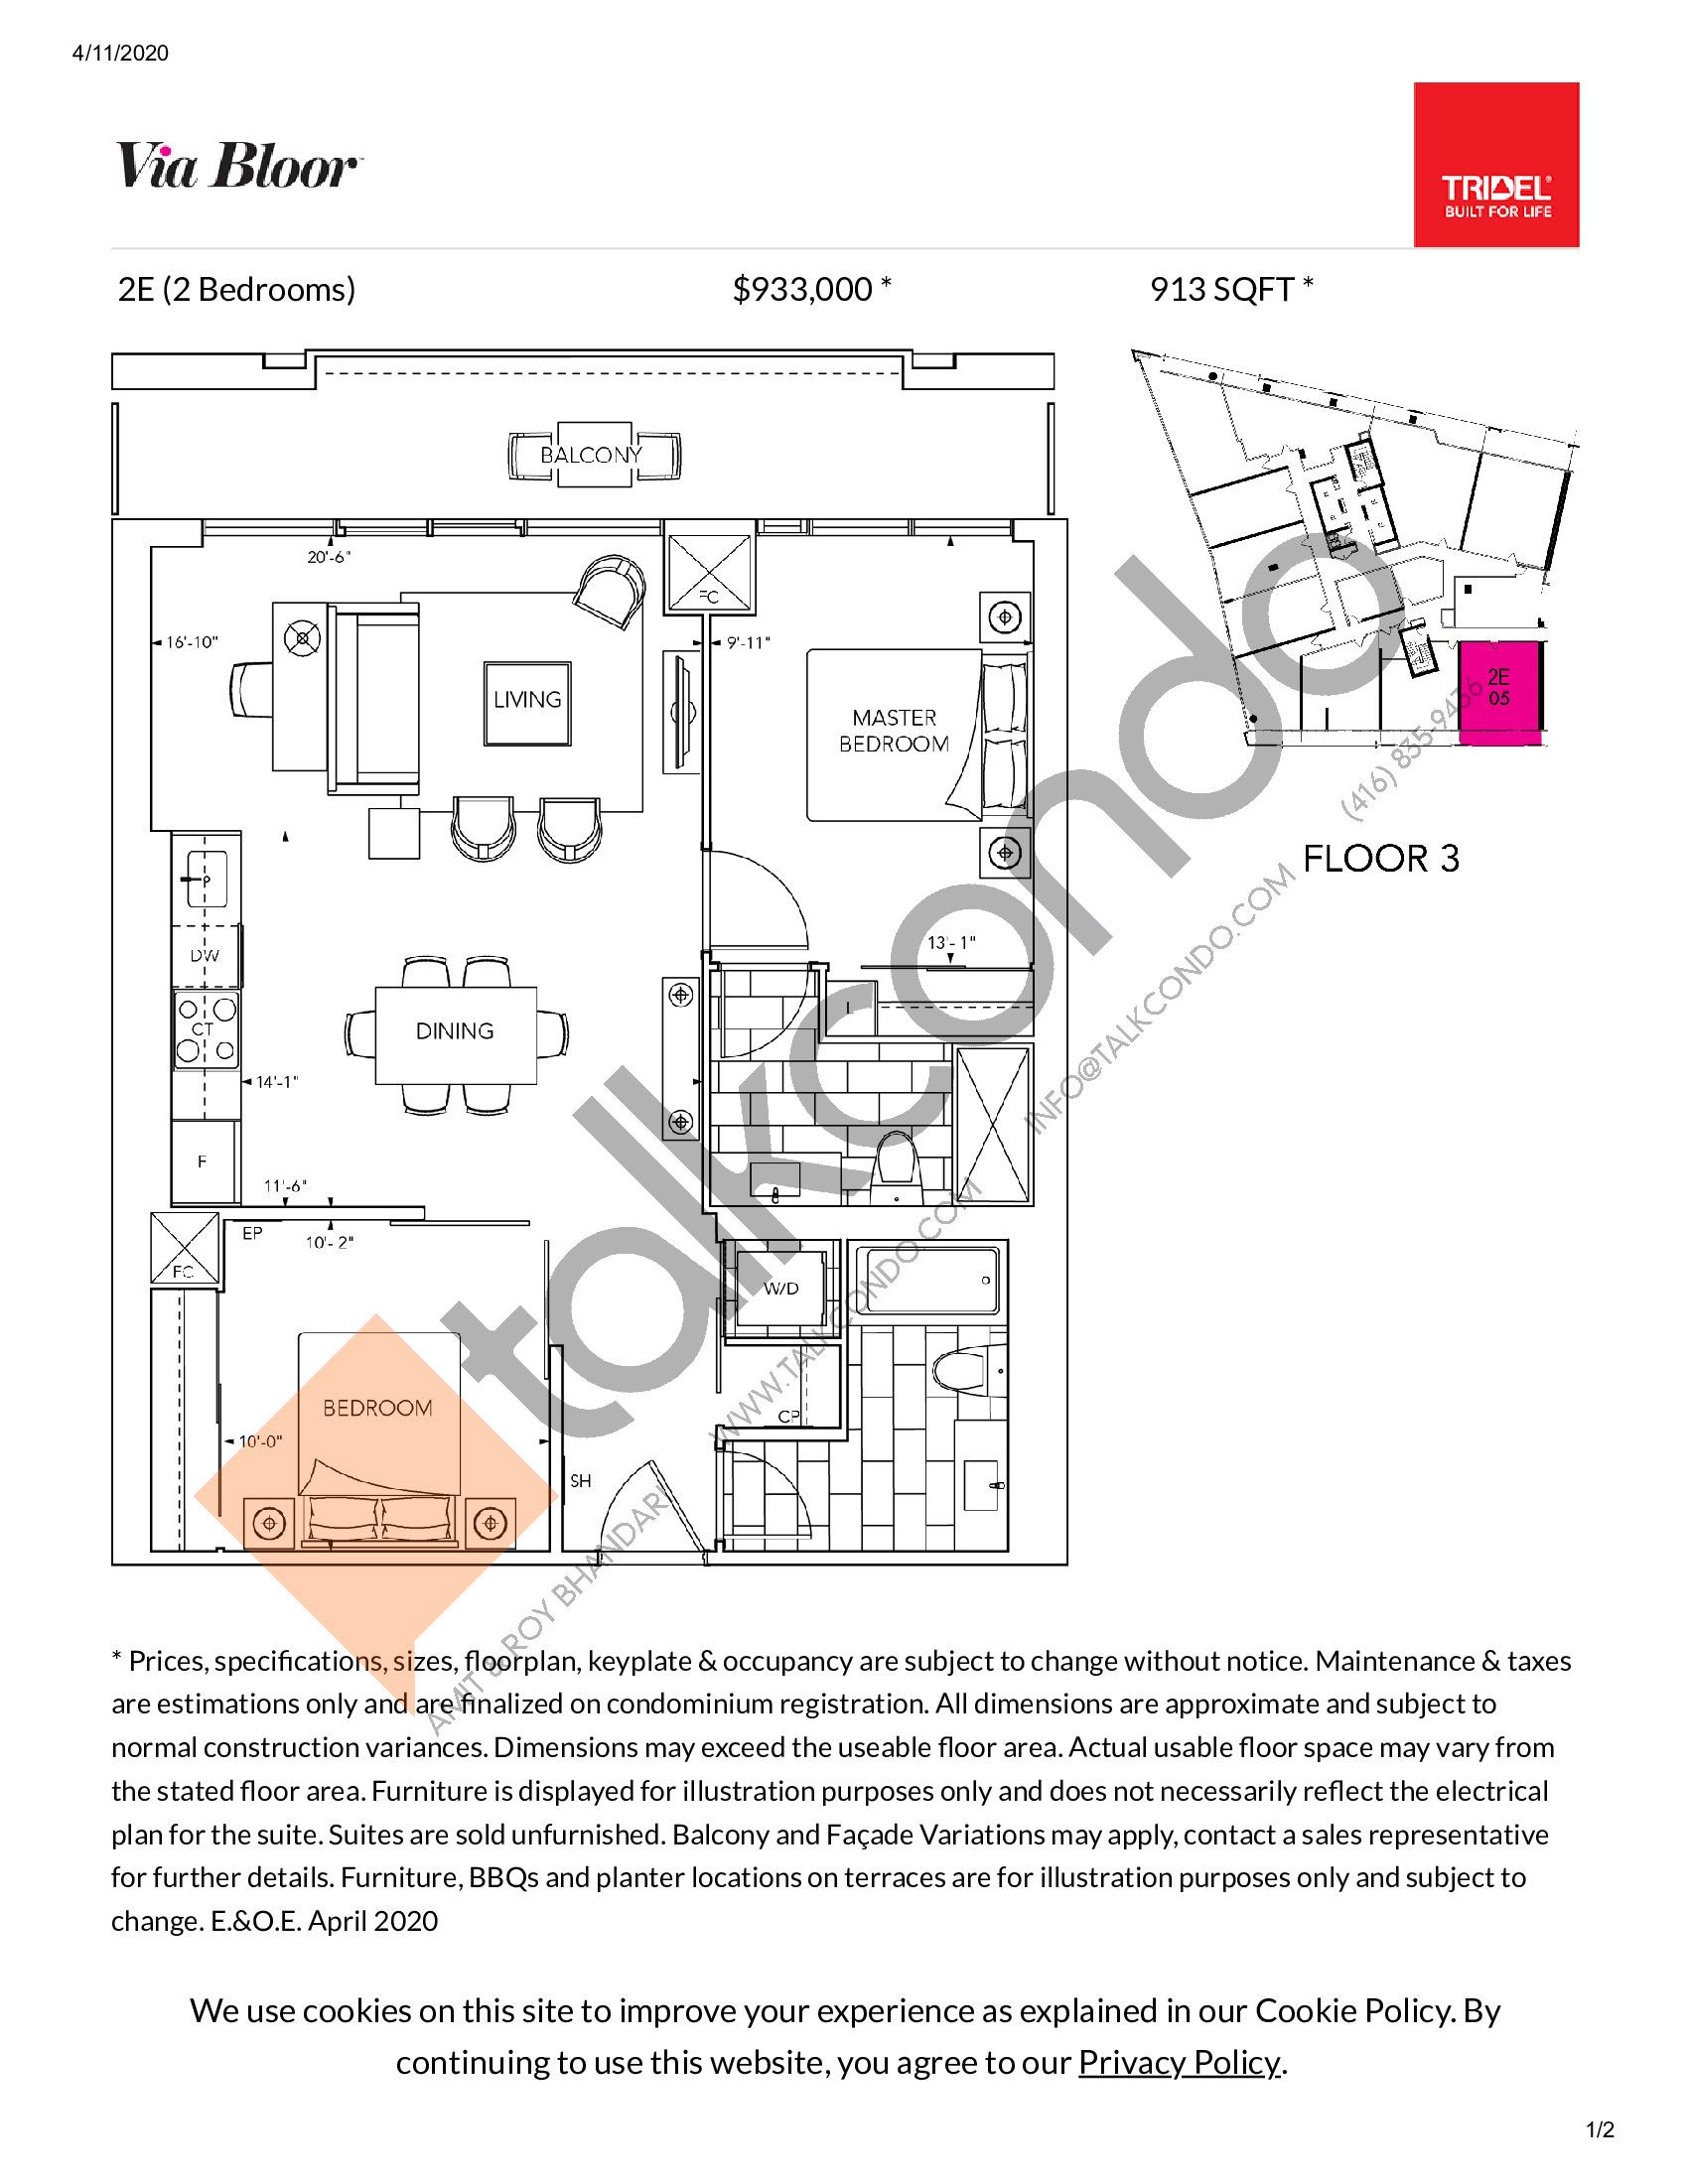 2E Floor Plan at Via Bloor Condos - 913 sq.ft